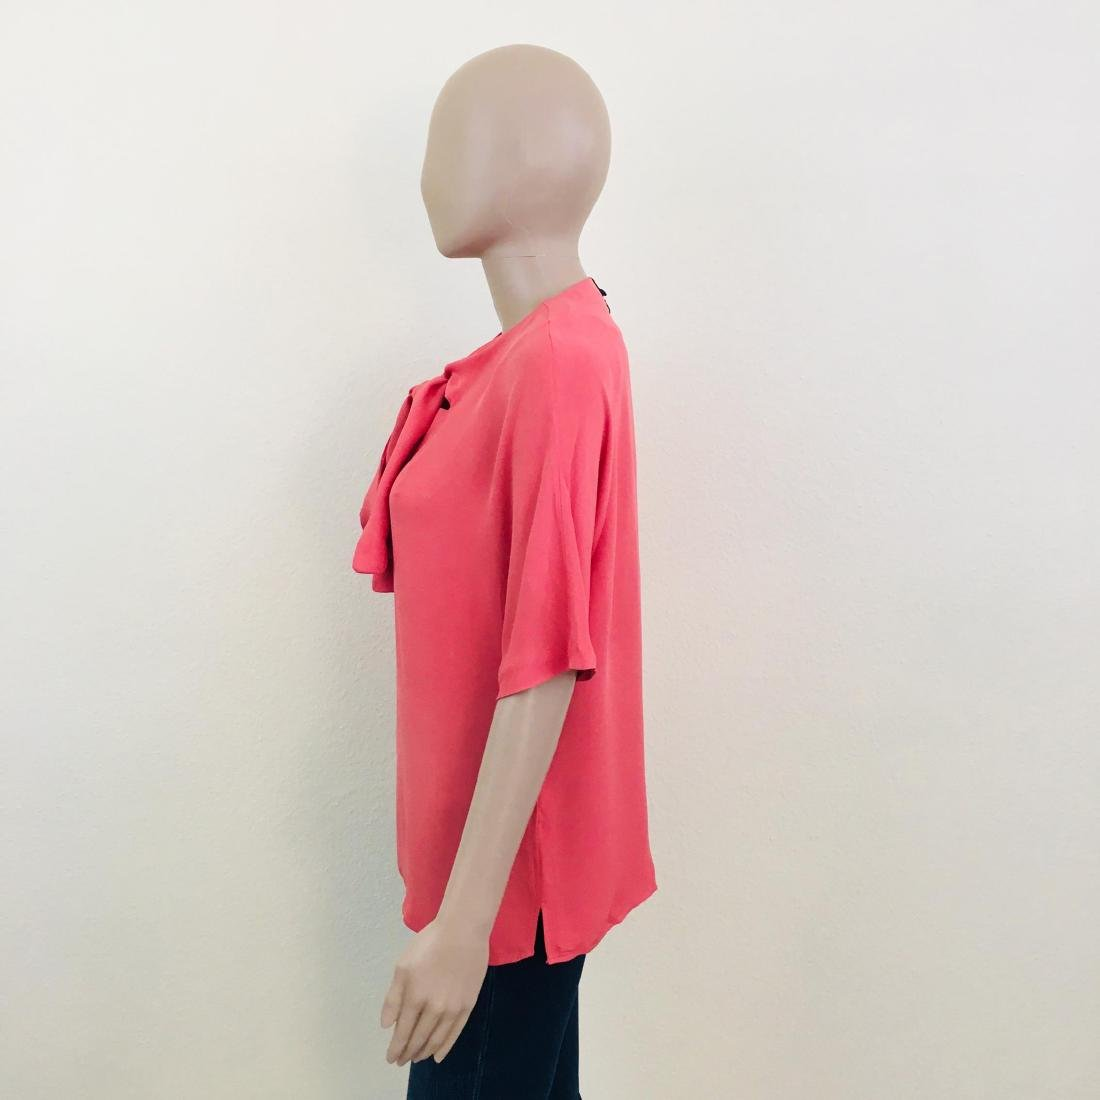 New Women's ZARA Top Blouse Size M - 6